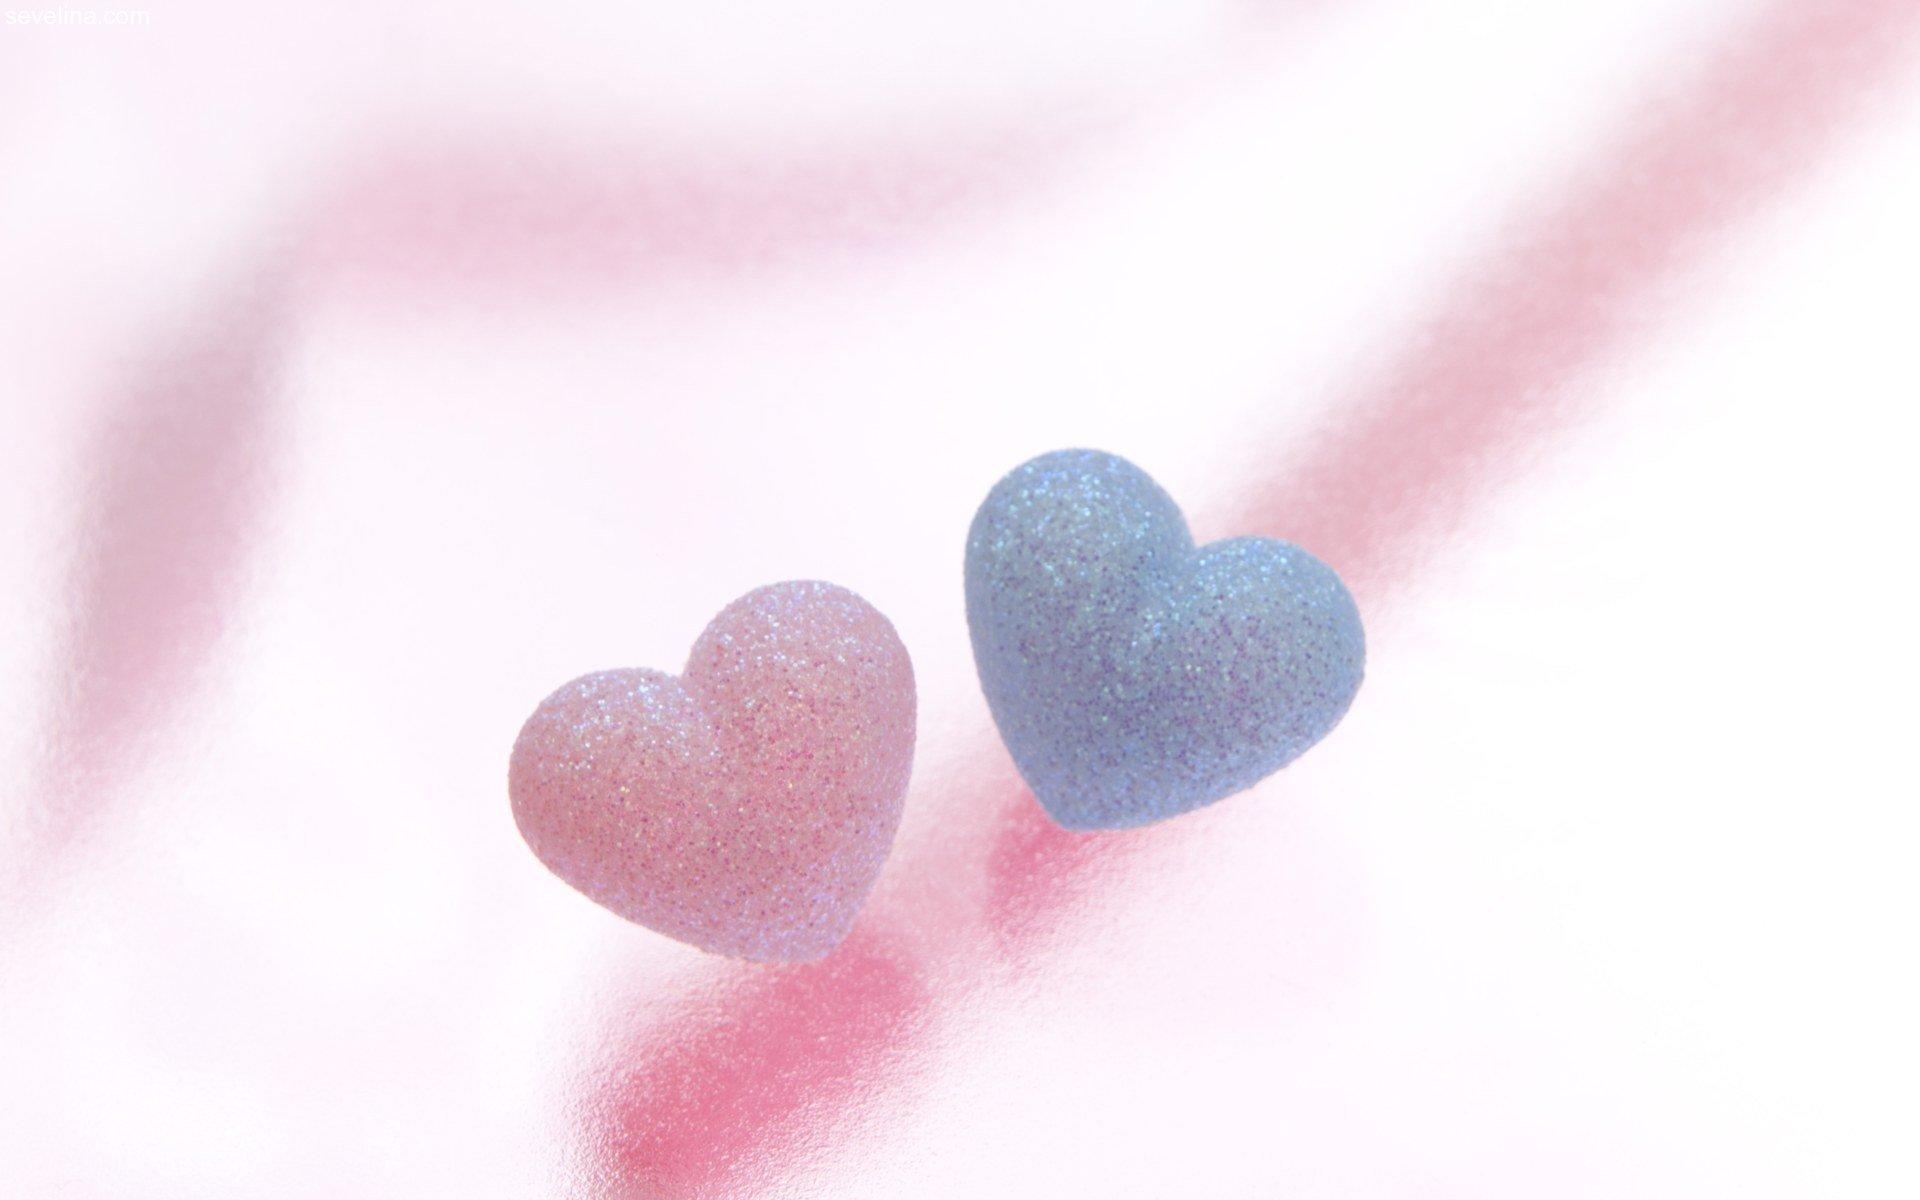 Cute love wallpaper for ipad